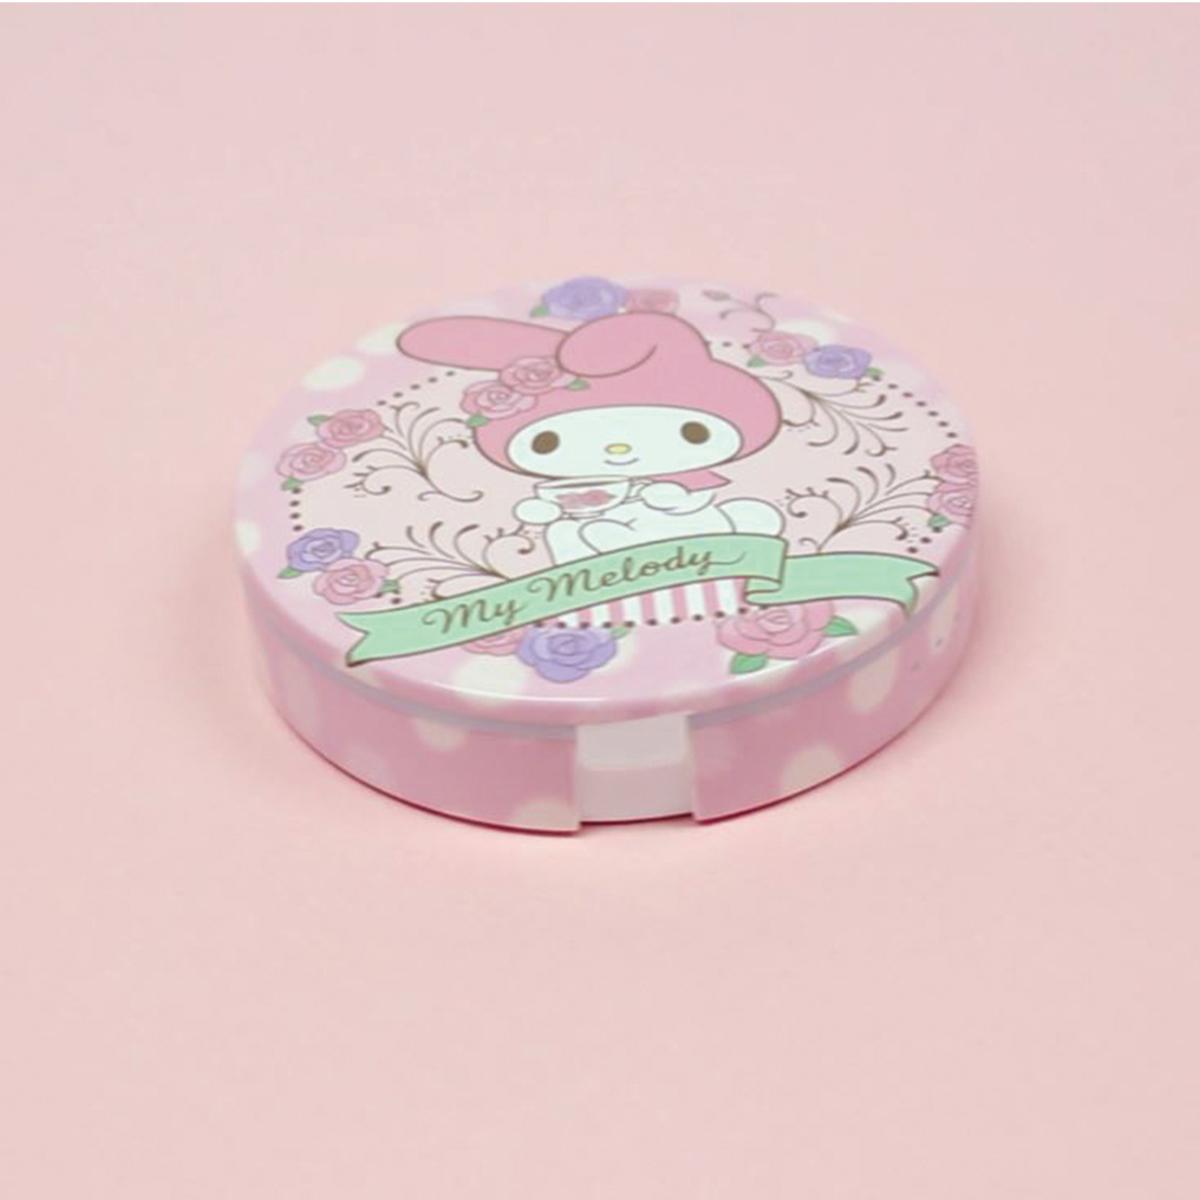 Sanrio My Melody LED燈鏡盒充電器 4500mah